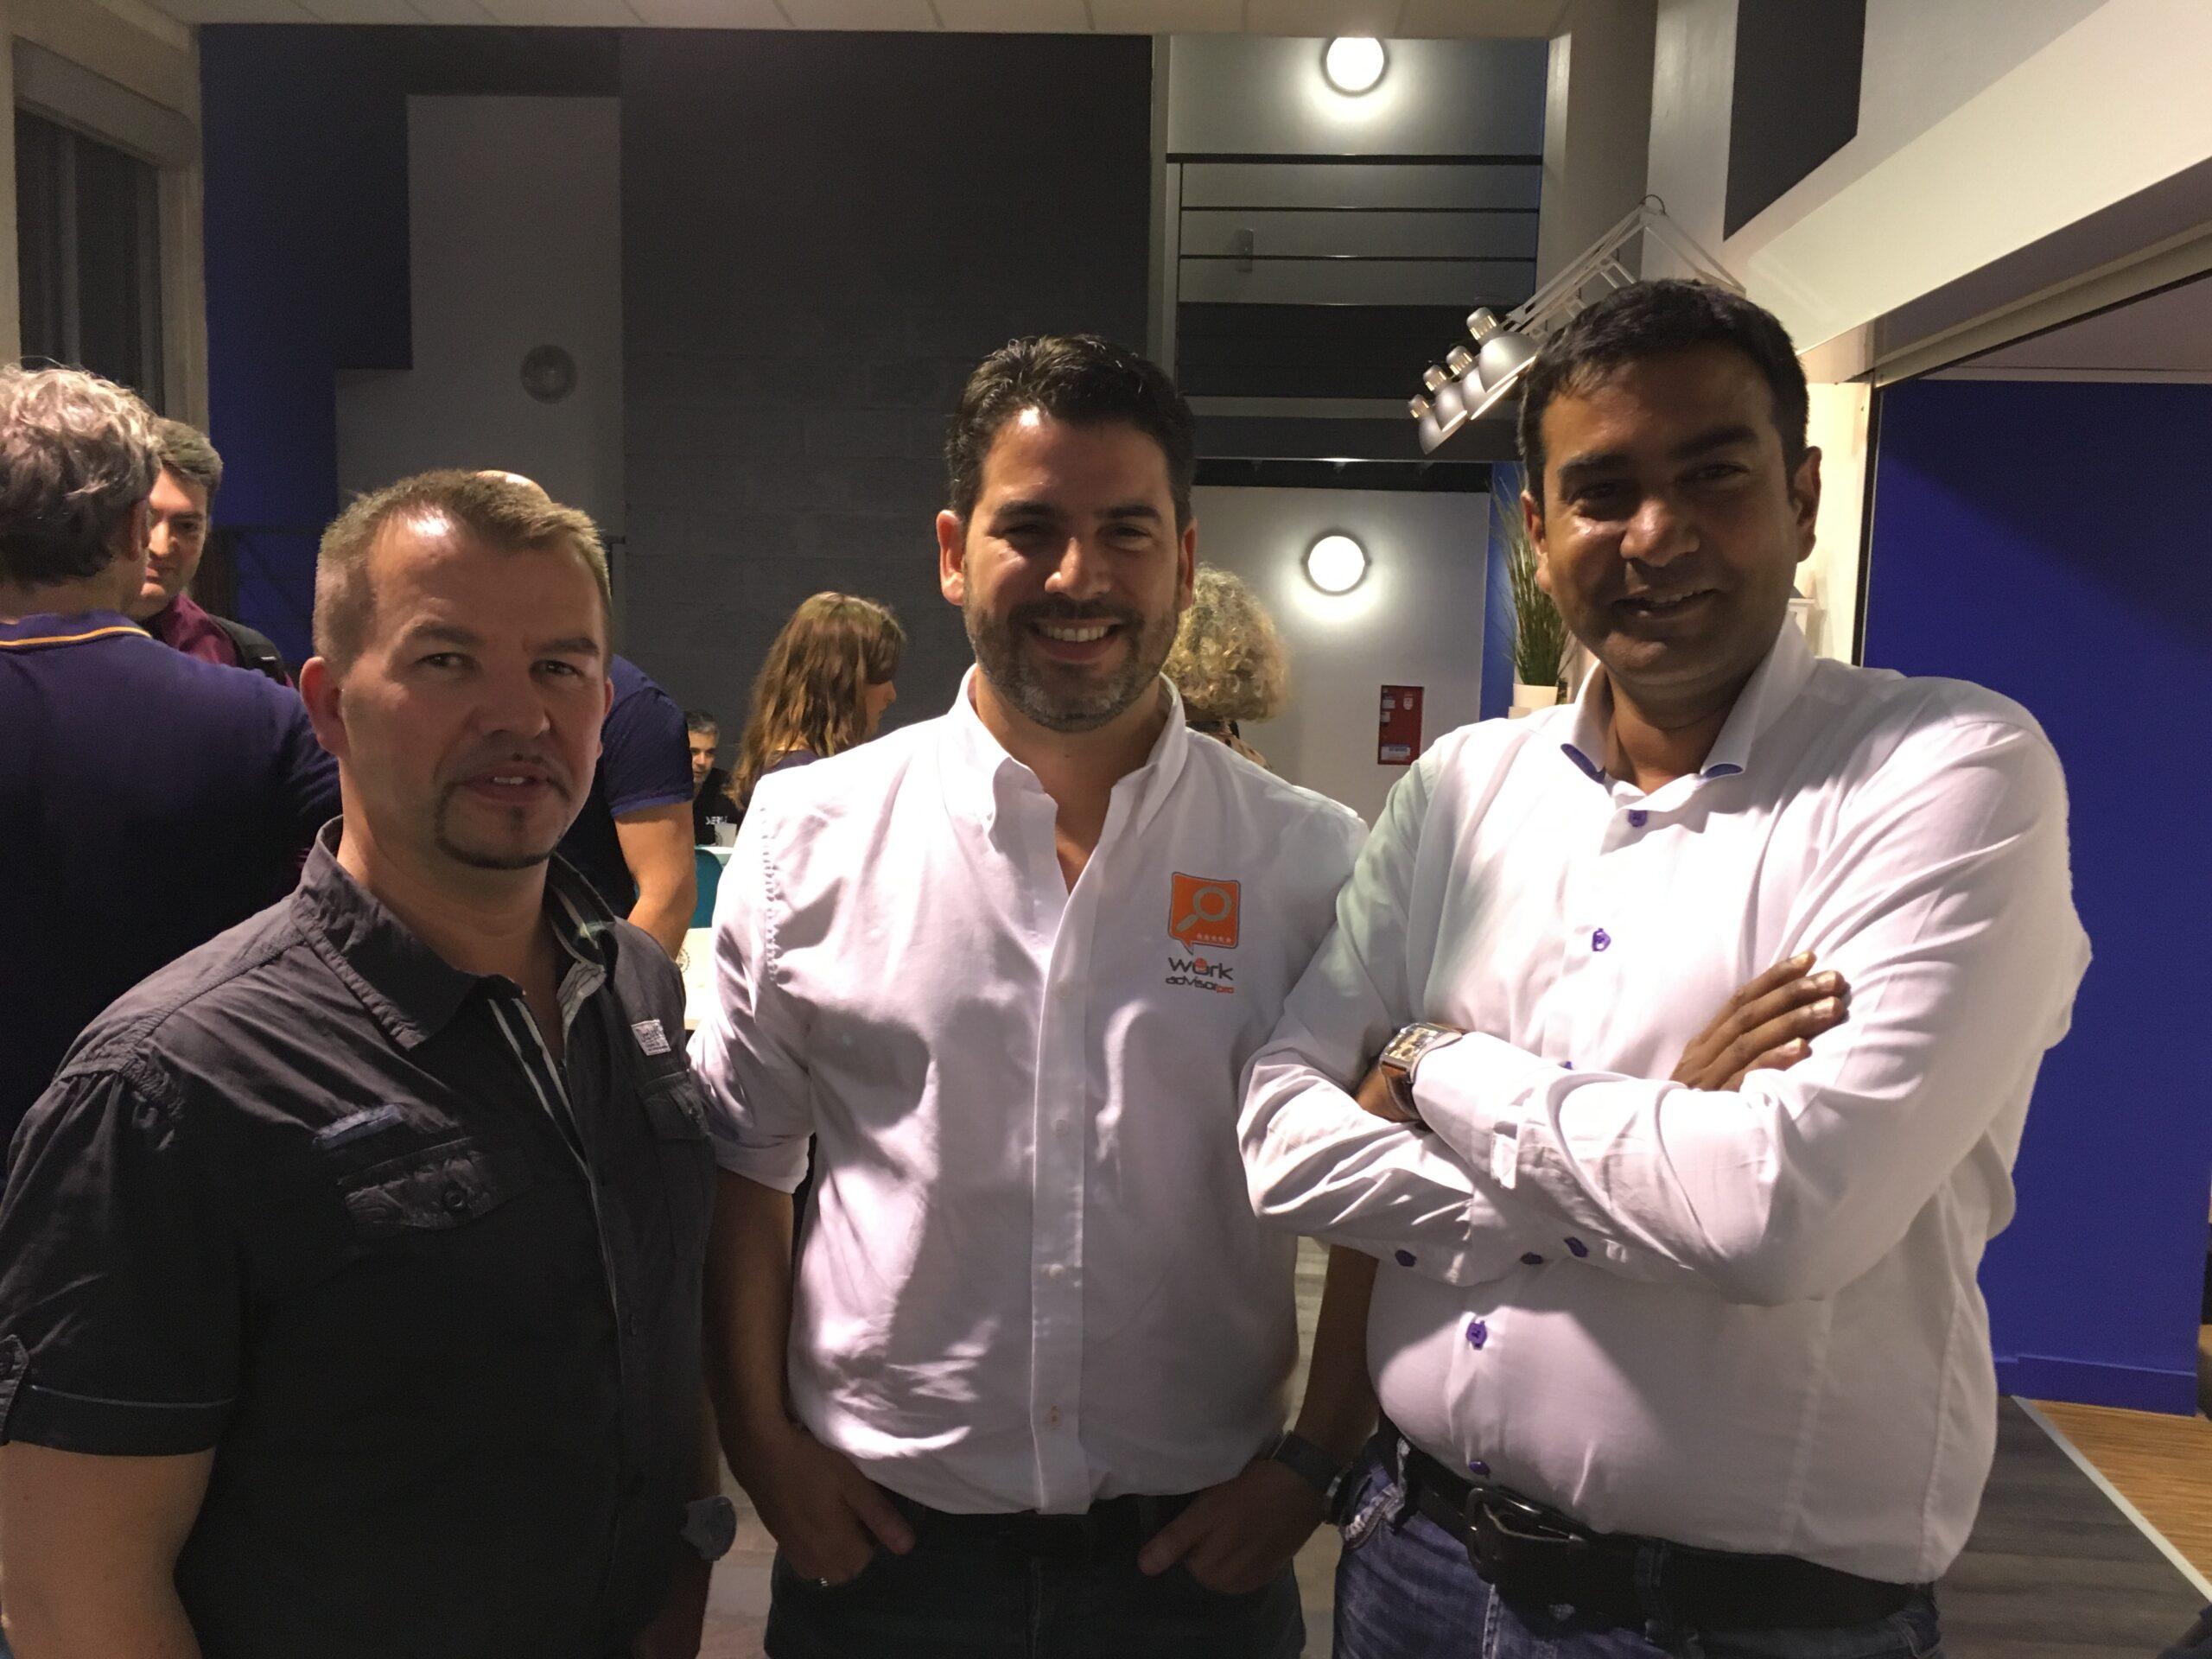 Wekey accompagne la promo de Start Innov et Benoît Maneuvrier devient mentor de WorkAdvisor !